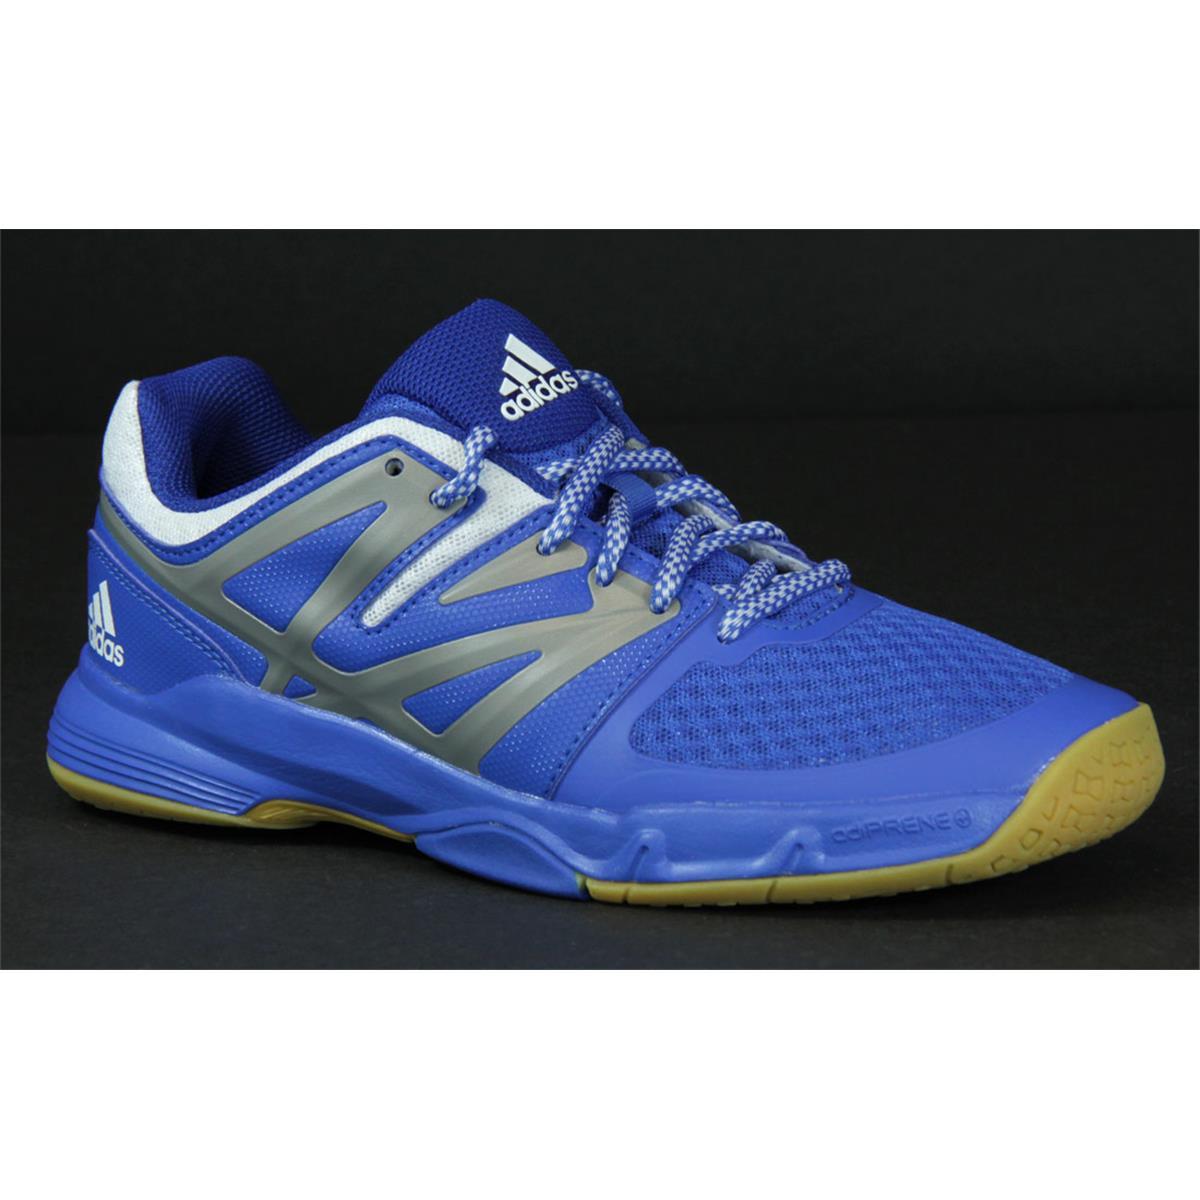 Stabil Adidas Adipower Jr Adidas Adipower nPwk80O